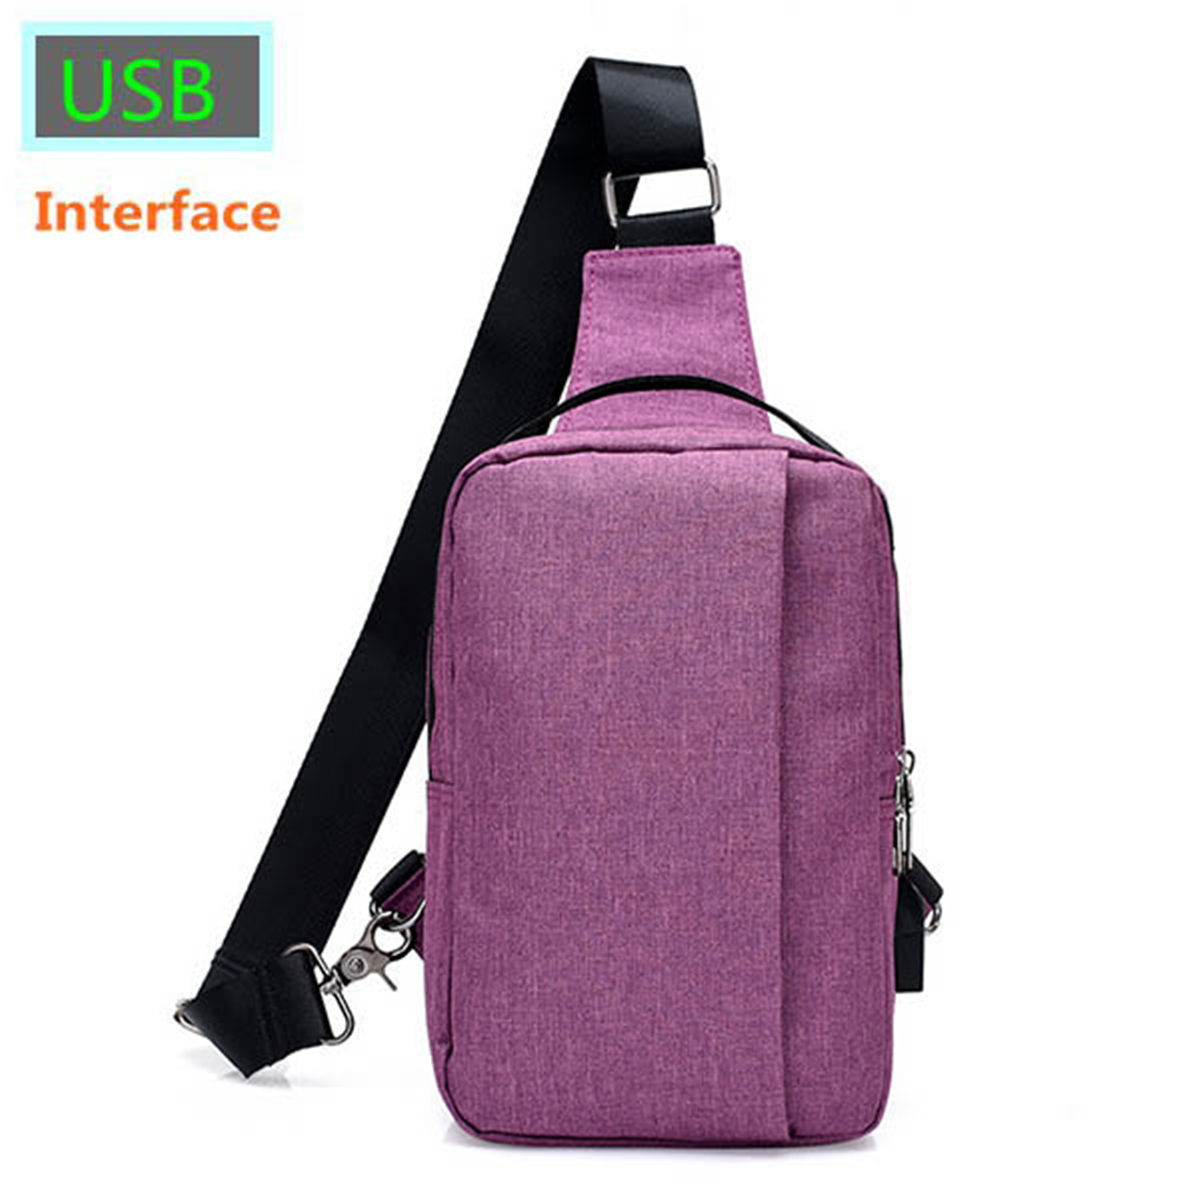 Women-Men-Nylon-USB-Port-Chest-Shoulder-Bag-School-Handbag-Crossbody-Tote-Pack